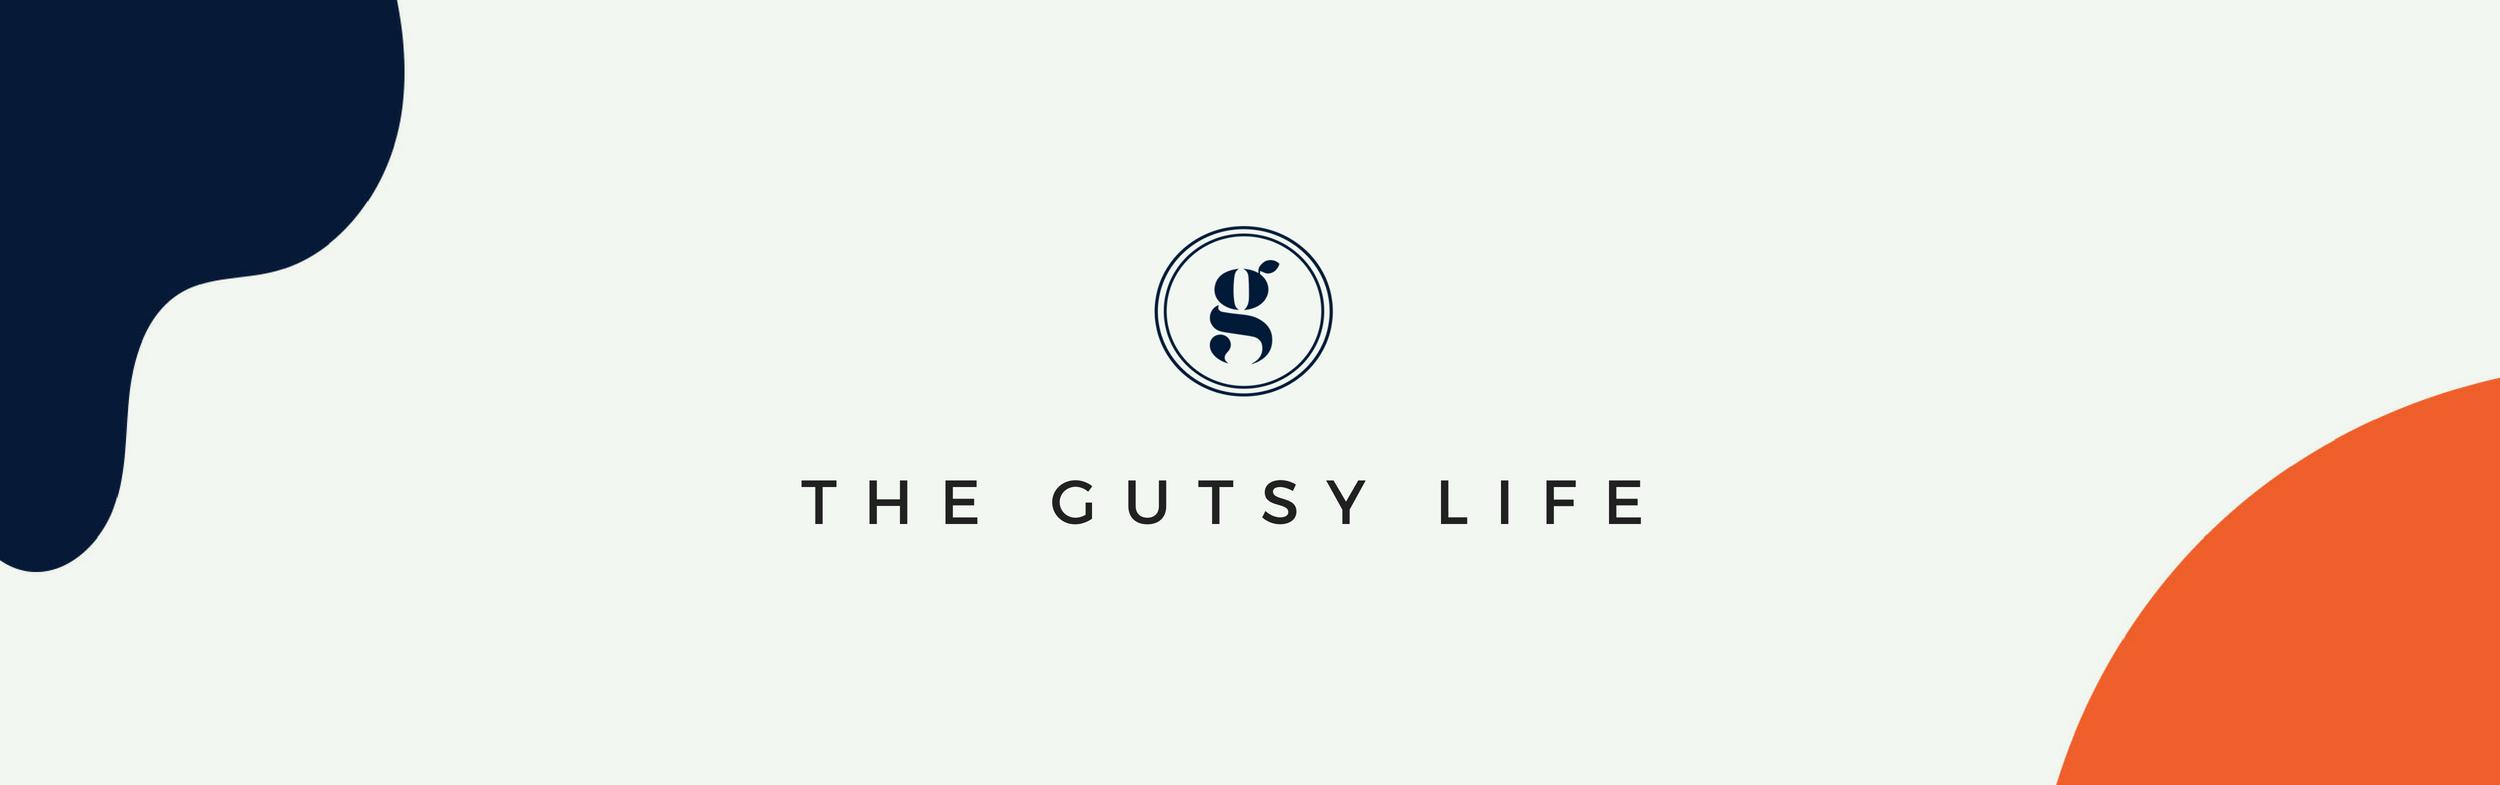 GUT HEALTH THE GUTSY LIFE